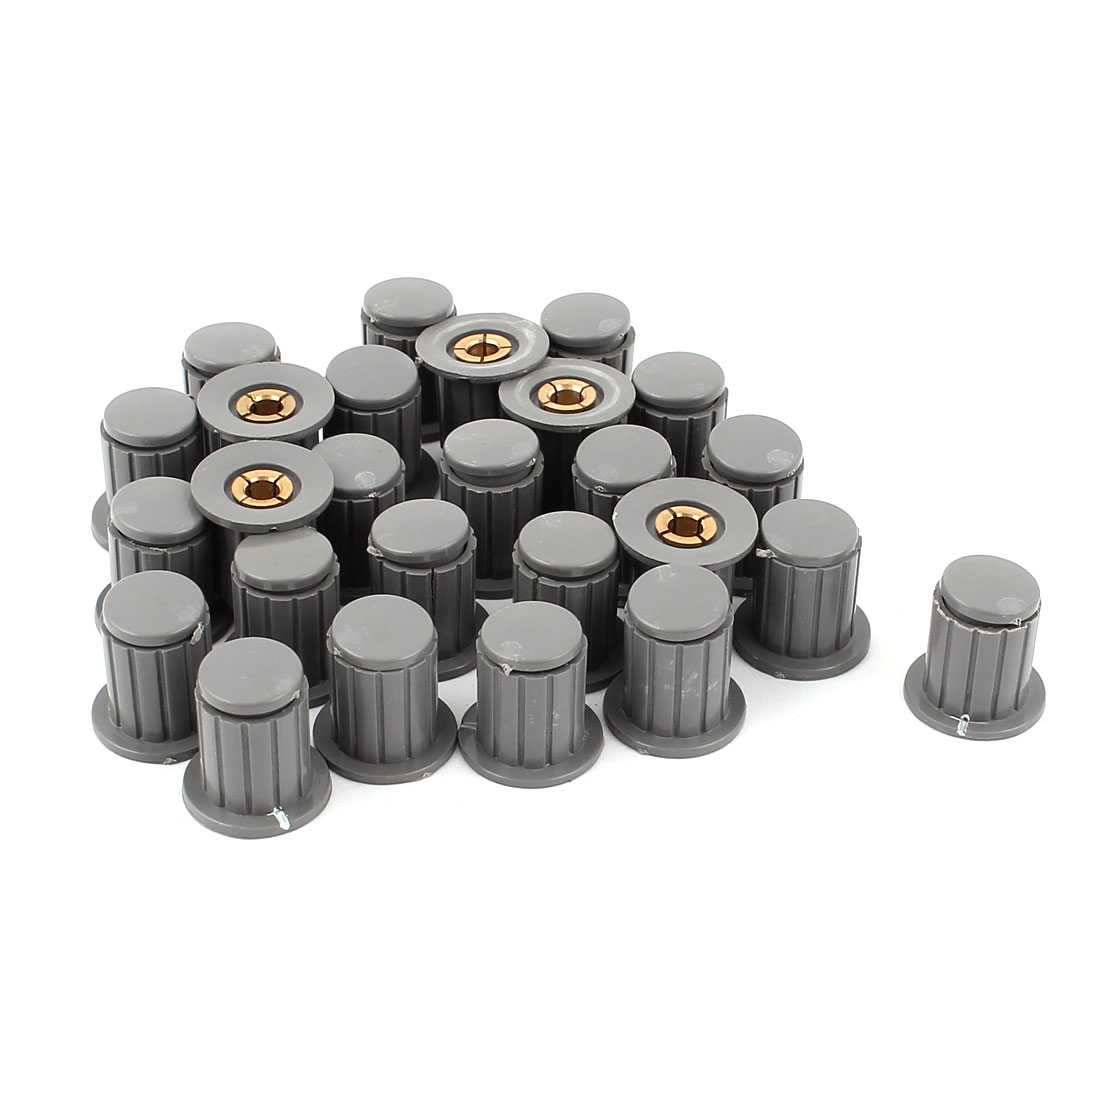 26Pcs Brass Insert Split Hole Gray Plastic Volume Control Potentiometer Knobs Caps for 4mm Shaft